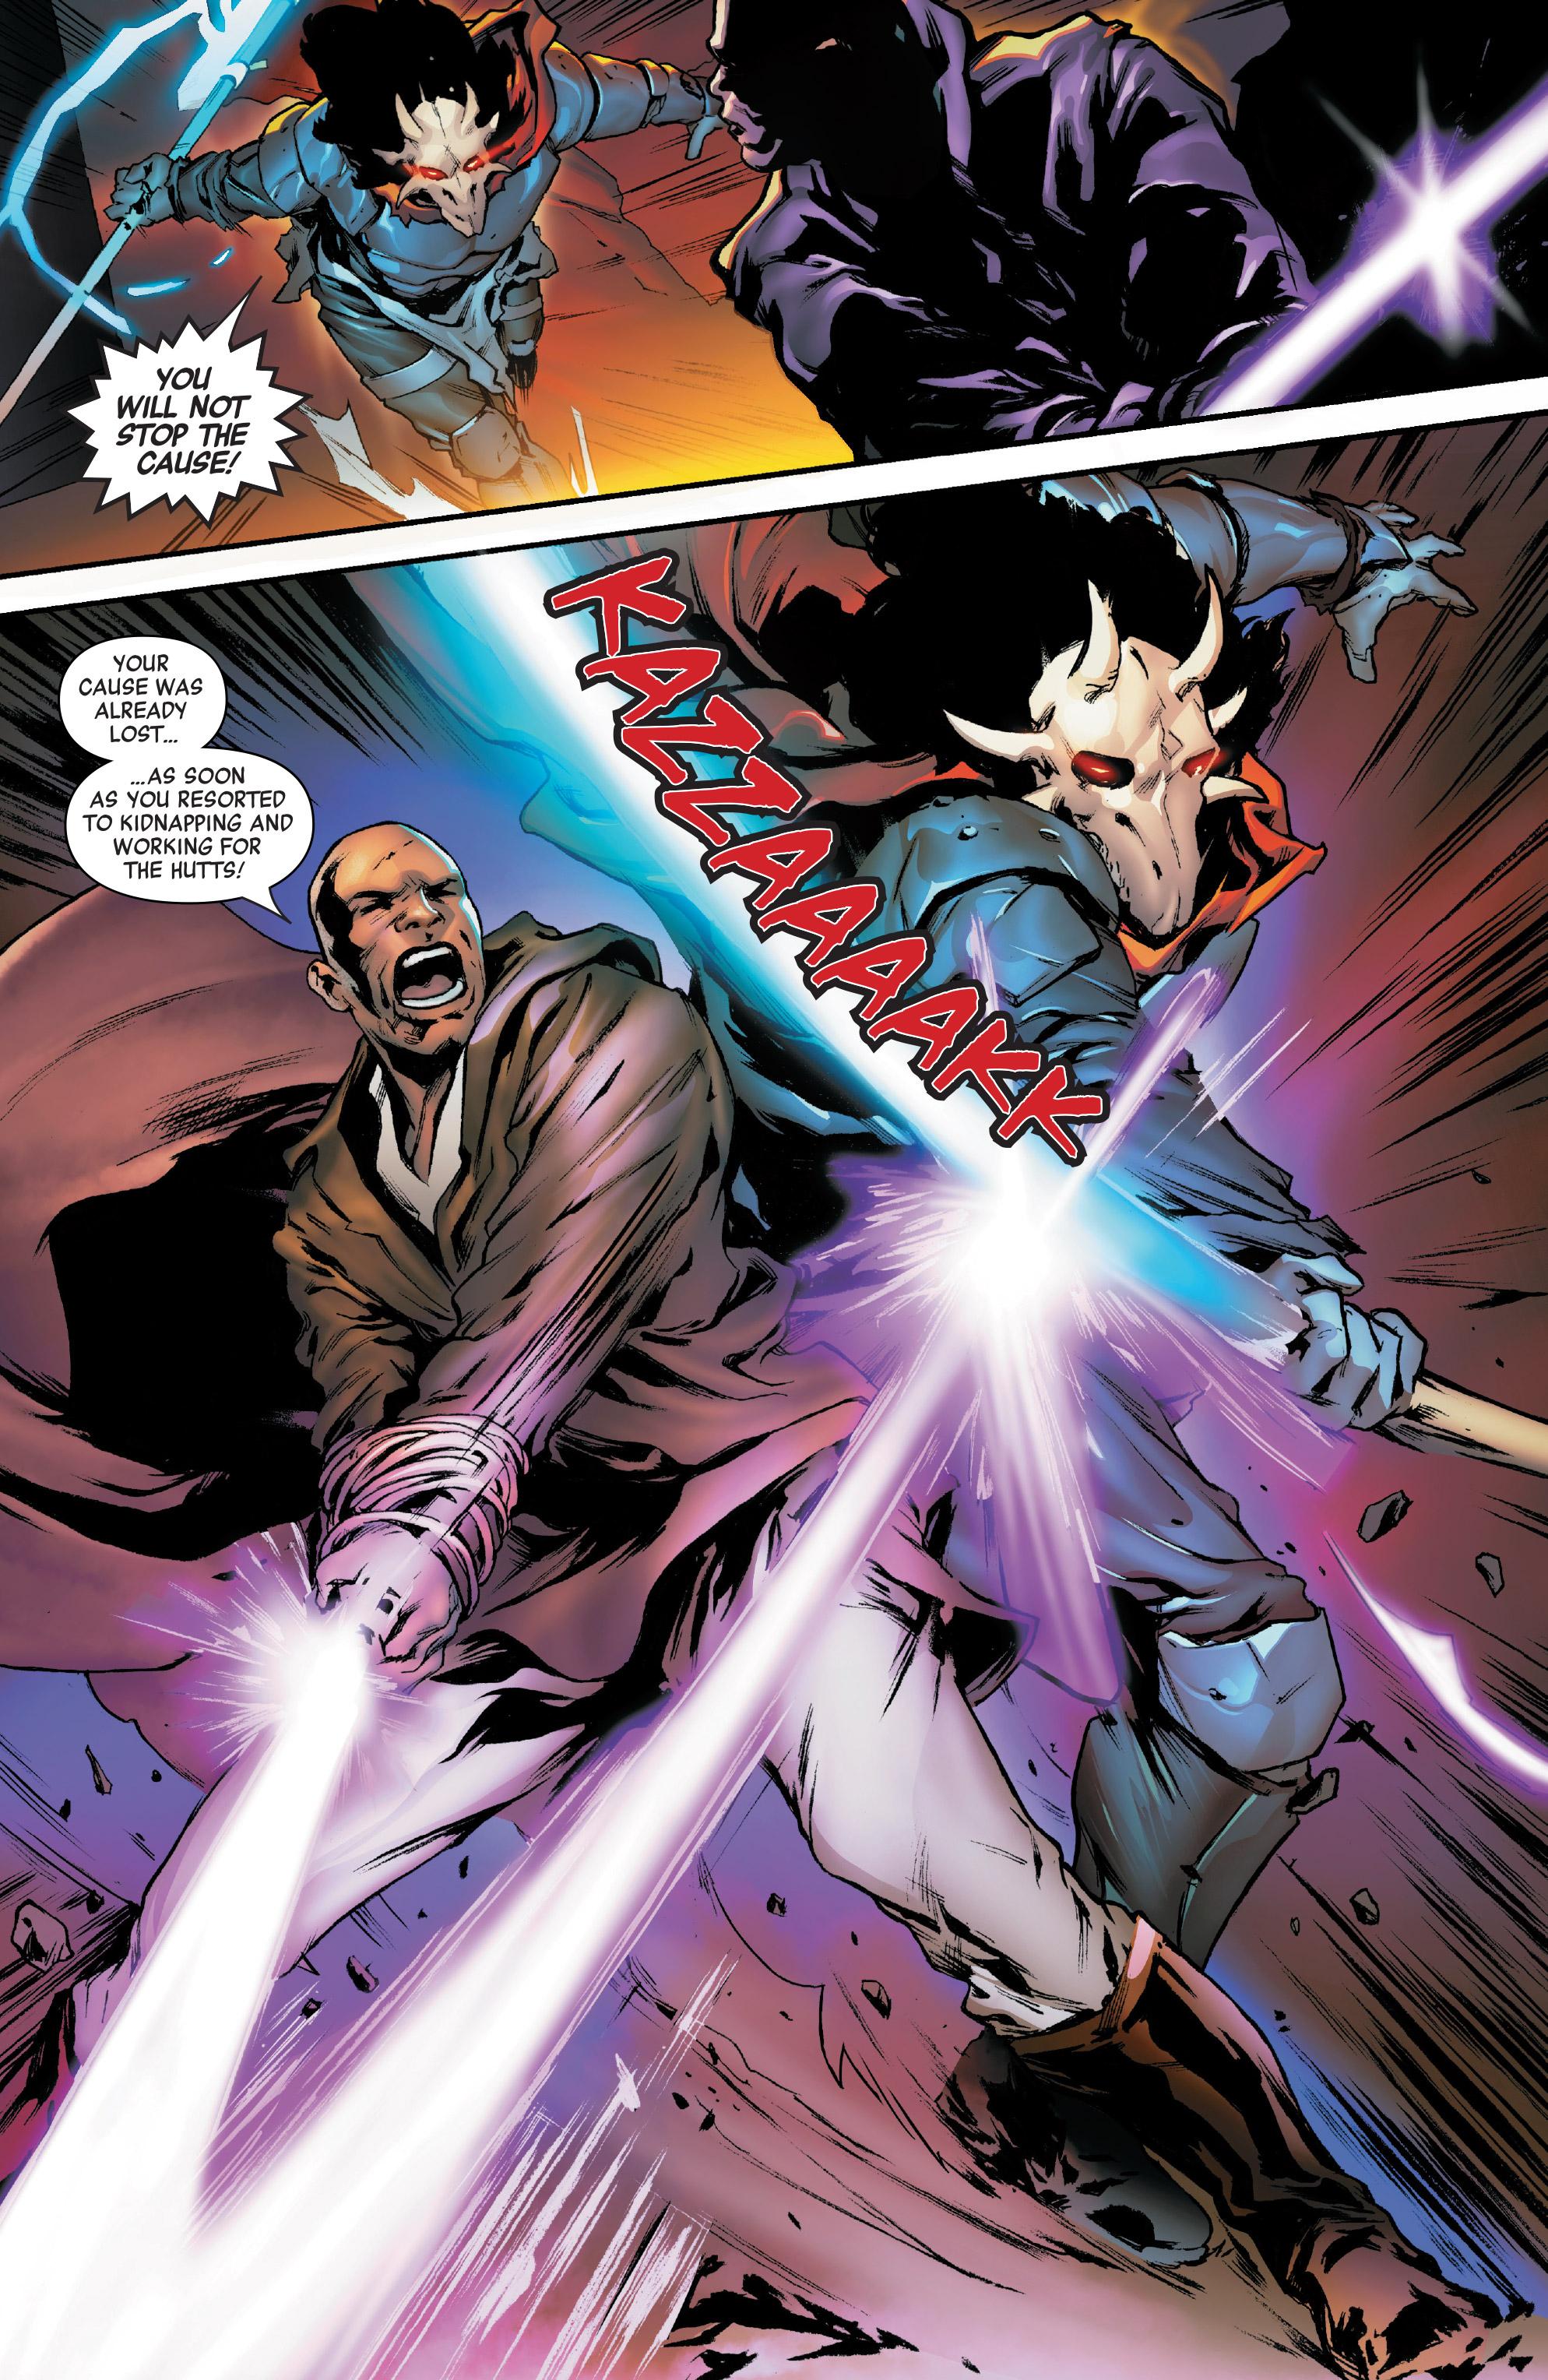 星球大战:共和国时代(2019年): Chapter 1 - Page 星球大战:共和国时代(2019年)